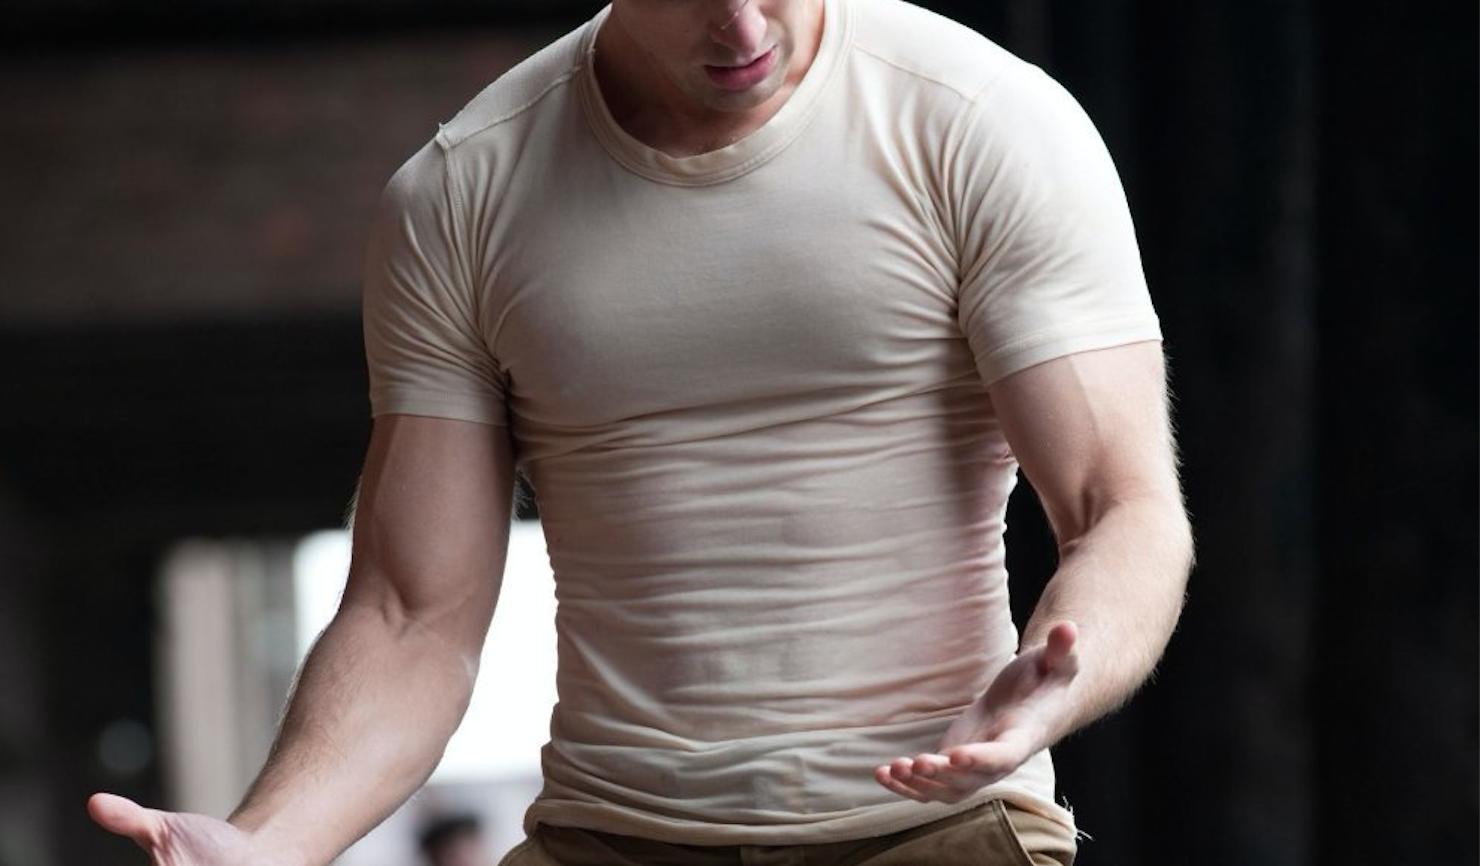 Chris Evans' Chest in Tshirt